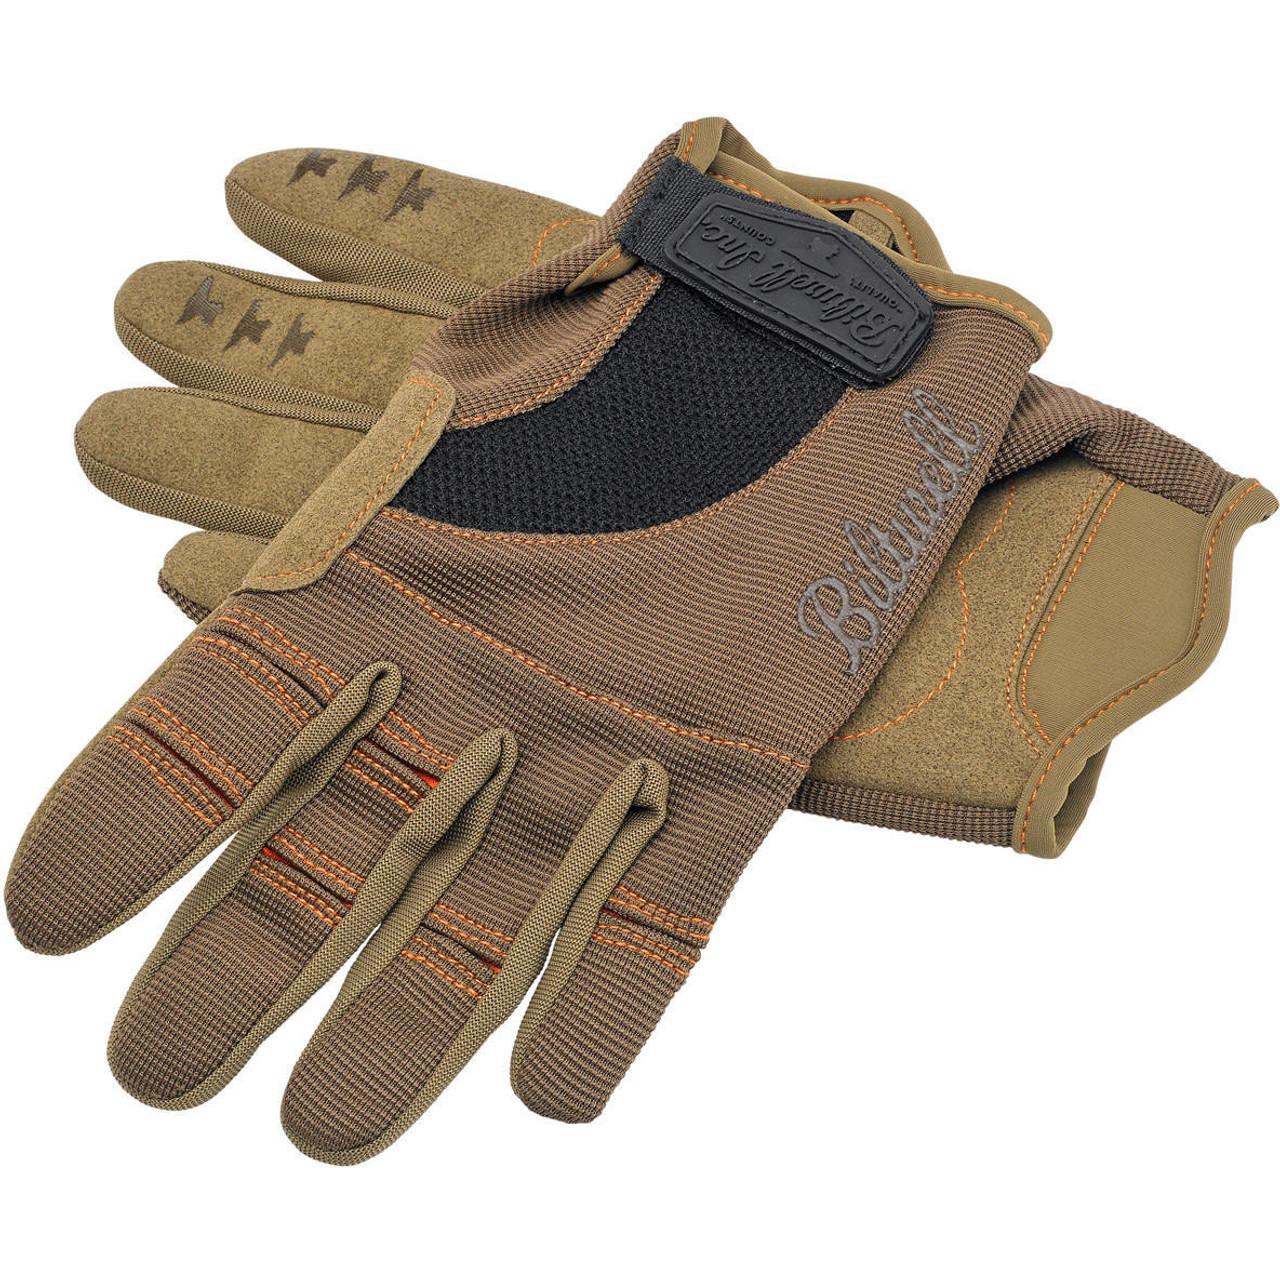 Biltwell Brown//Orange Moto Gloves Size Large